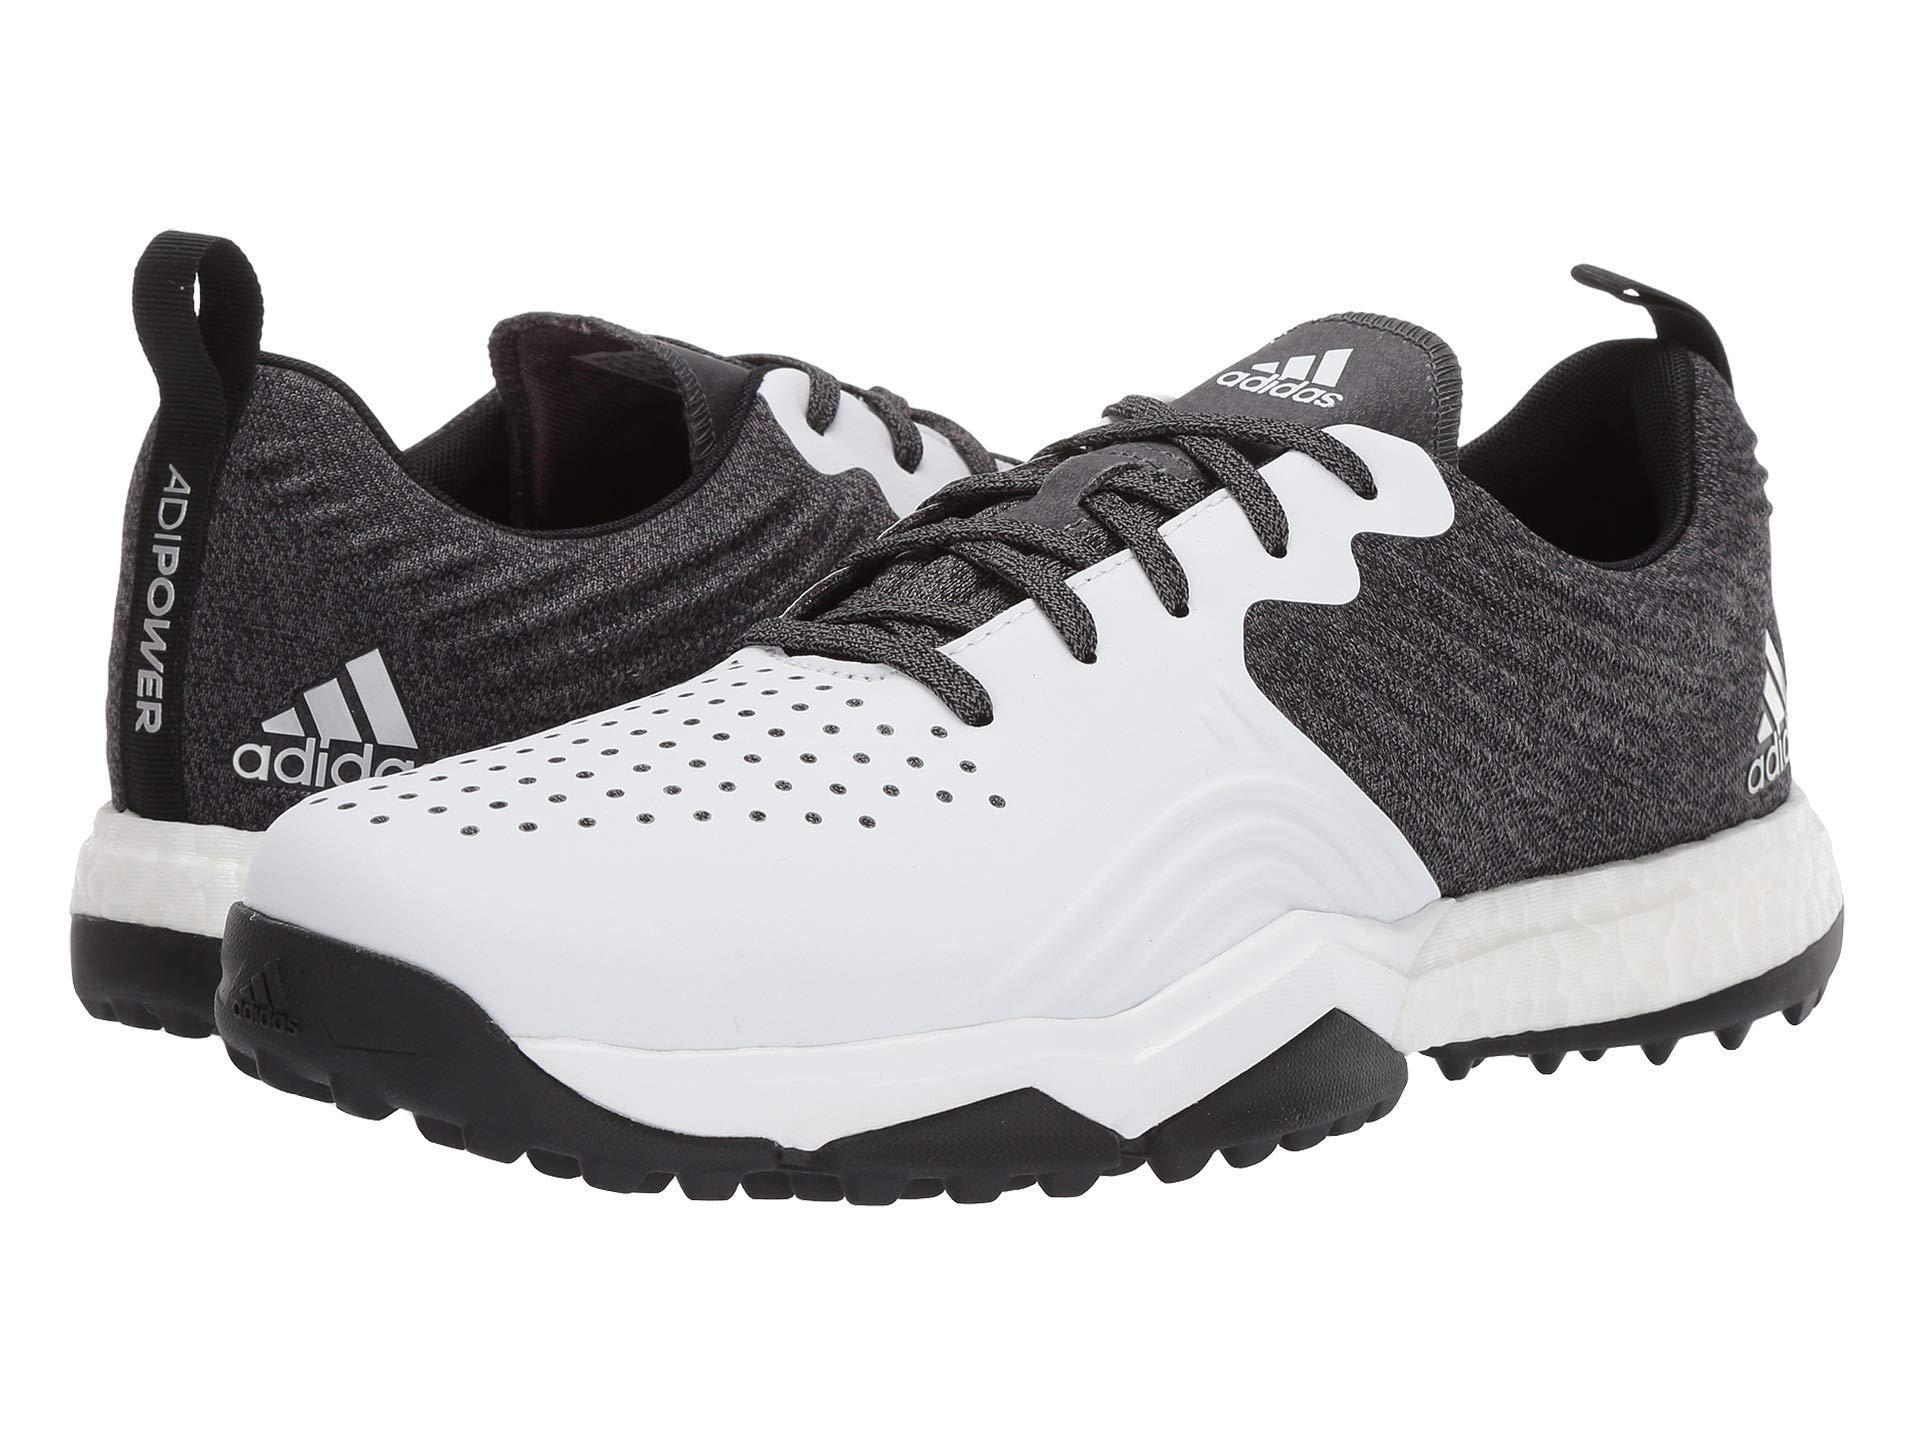 huge discount a1866 66cc1 Menn Originals blackredwhite Lyst Adidas 4orged S Adipower 7